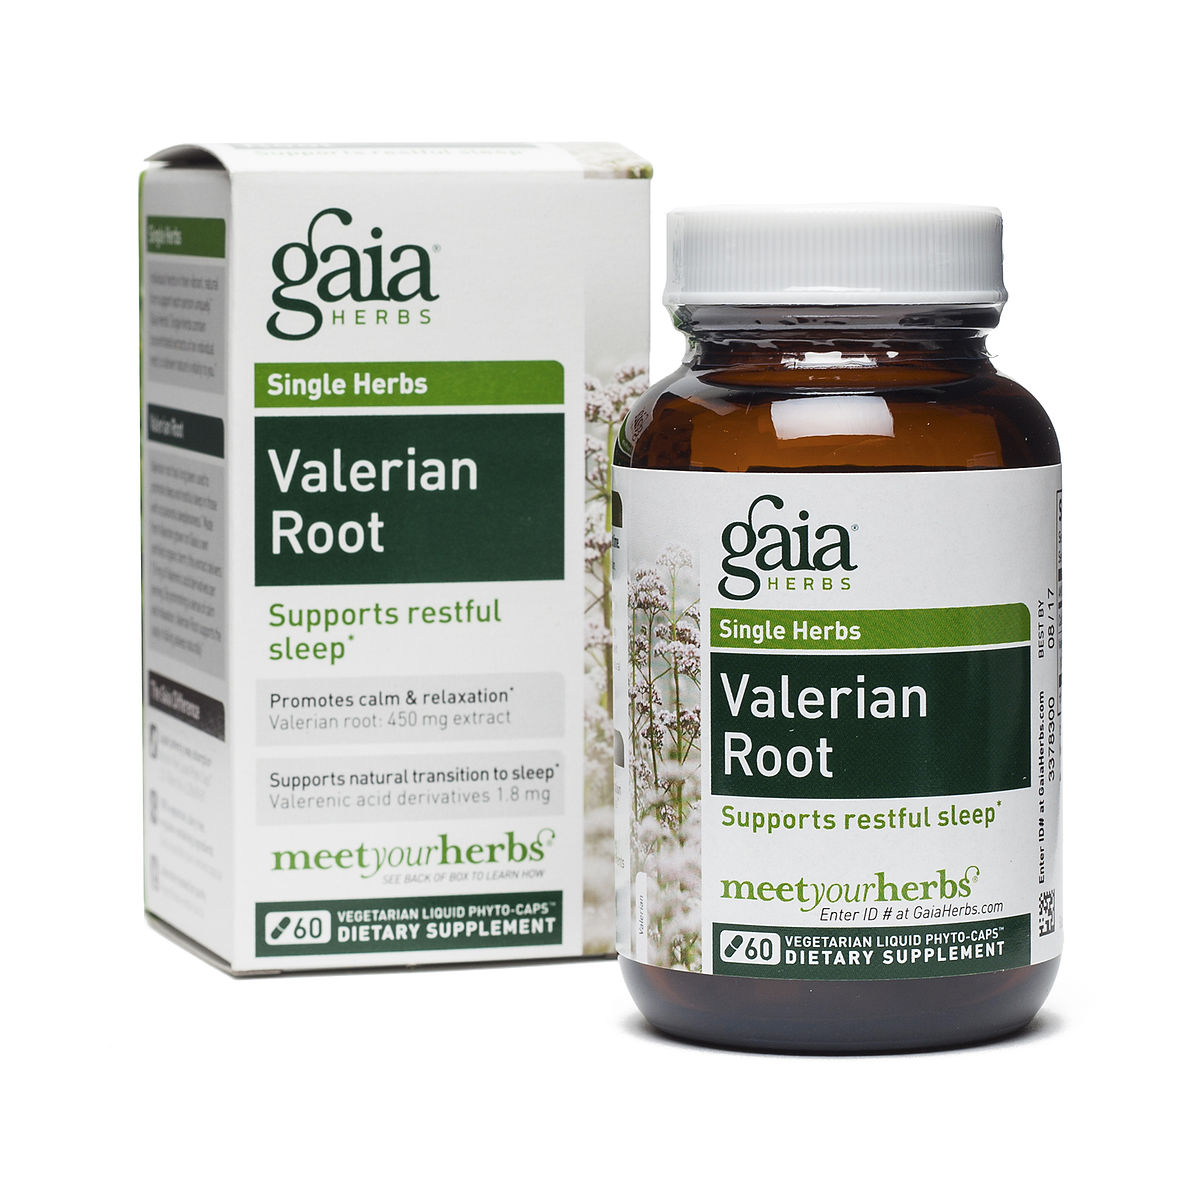 Sundown Naturals Valerian Root Reviews